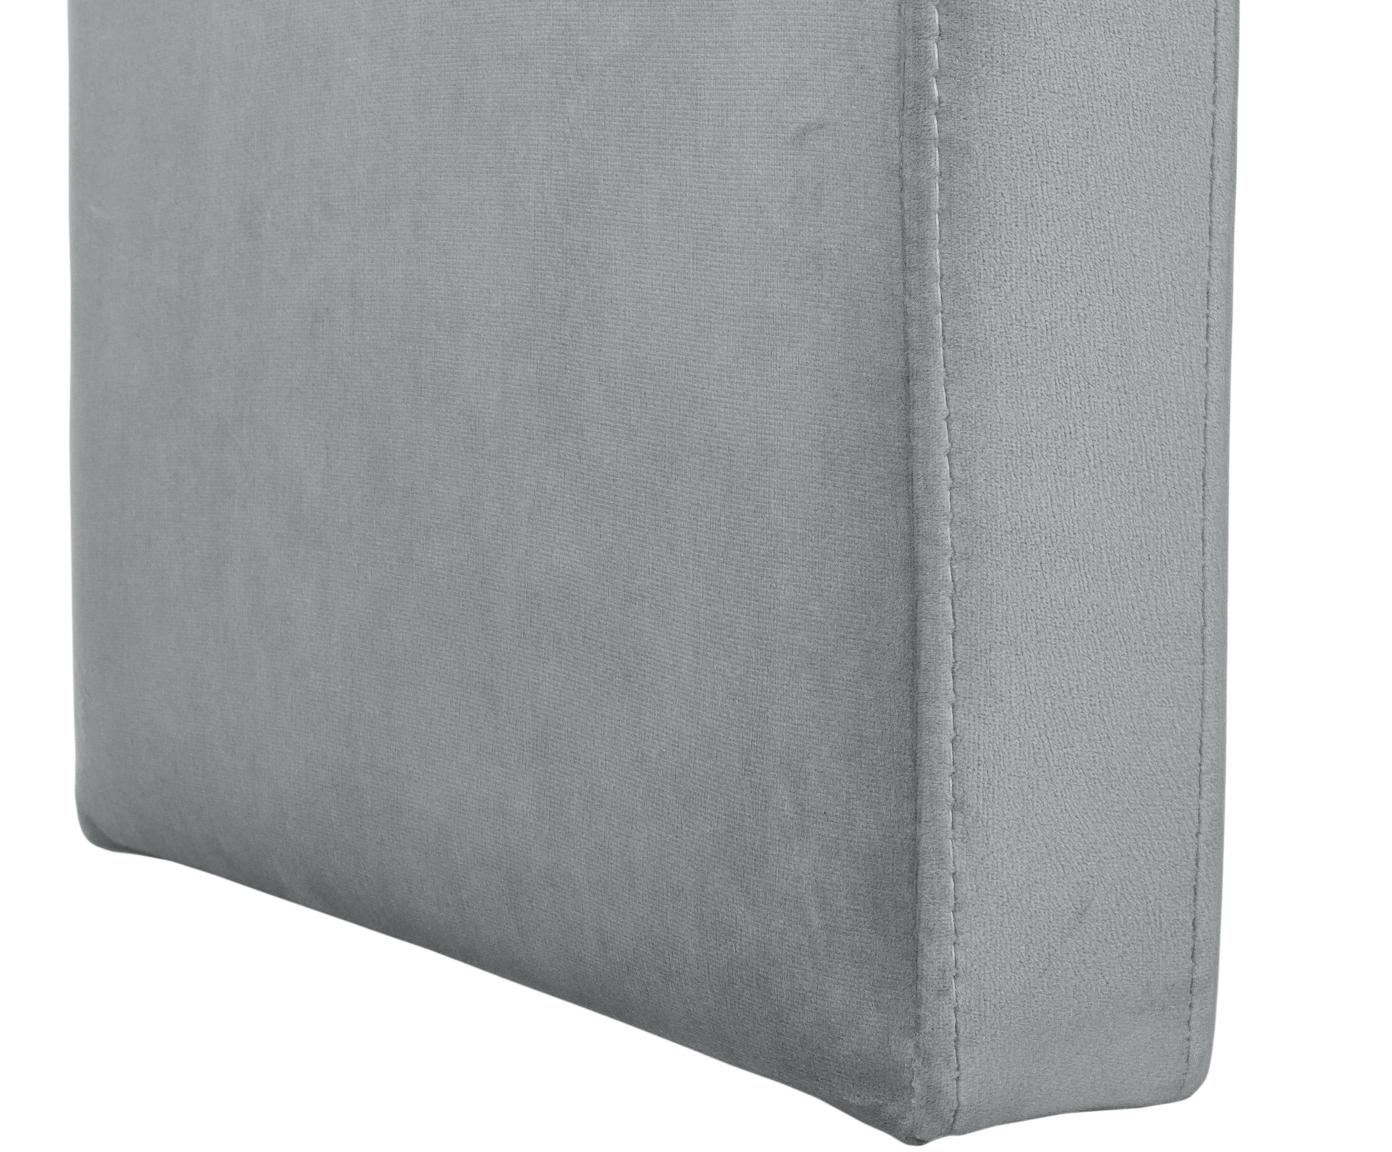 Moderne Samt-Polsterbank Penelope, Bezug: Samt (Polyester) 25.000 S, Gestell: Metall, Spanholz, Grau, 110 x 46 cm